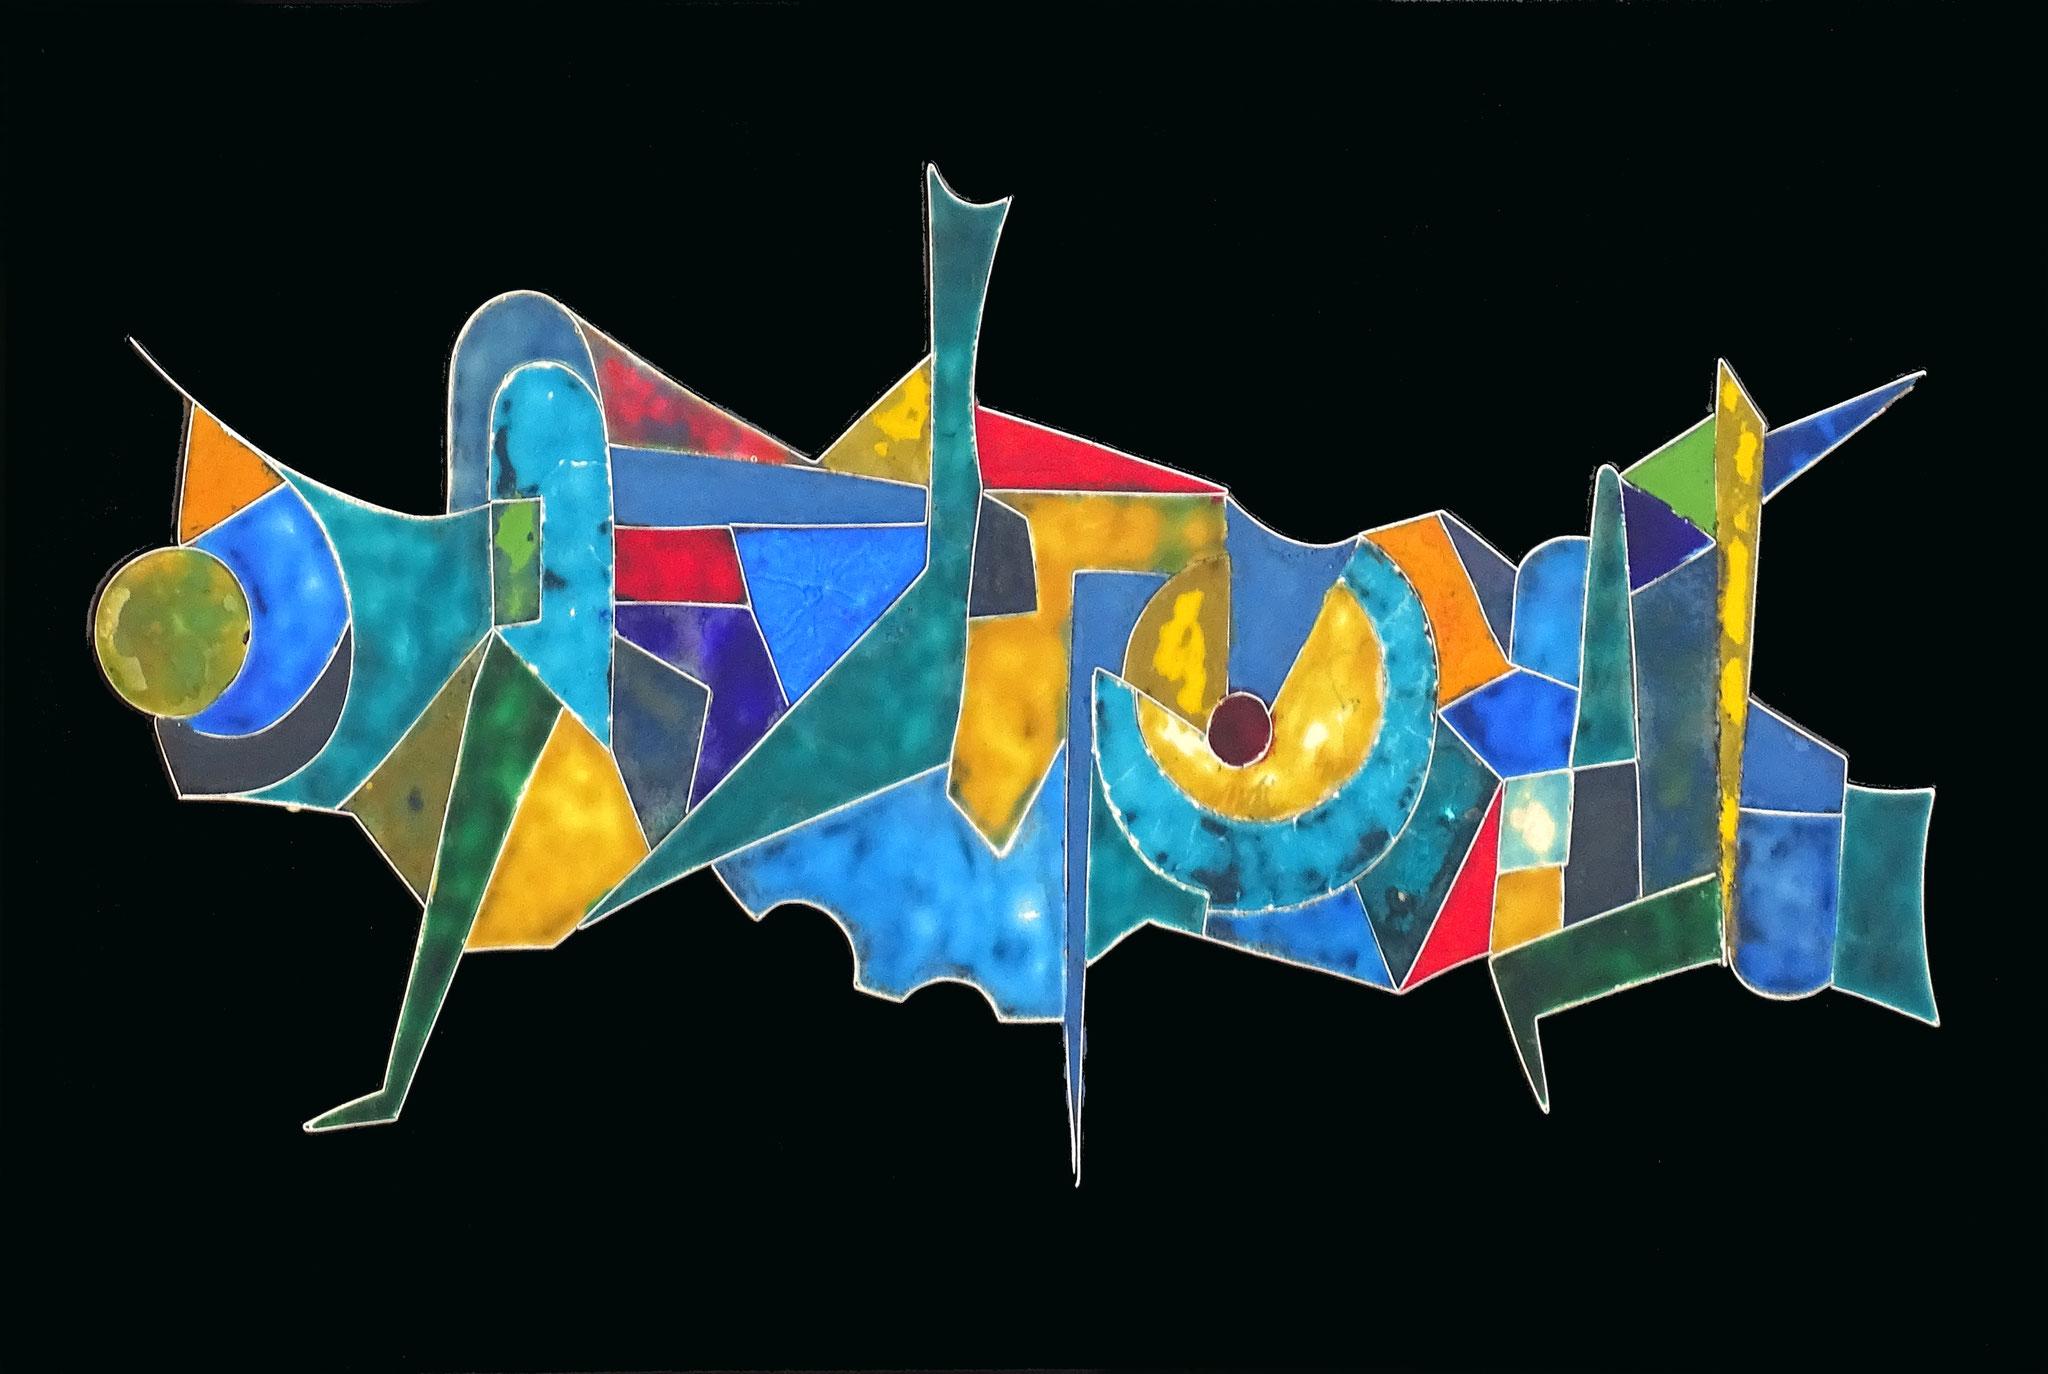 """Wurm"" 2015, 60 x 40 cm, Stegemail, Silberstege, matt geschliffen"